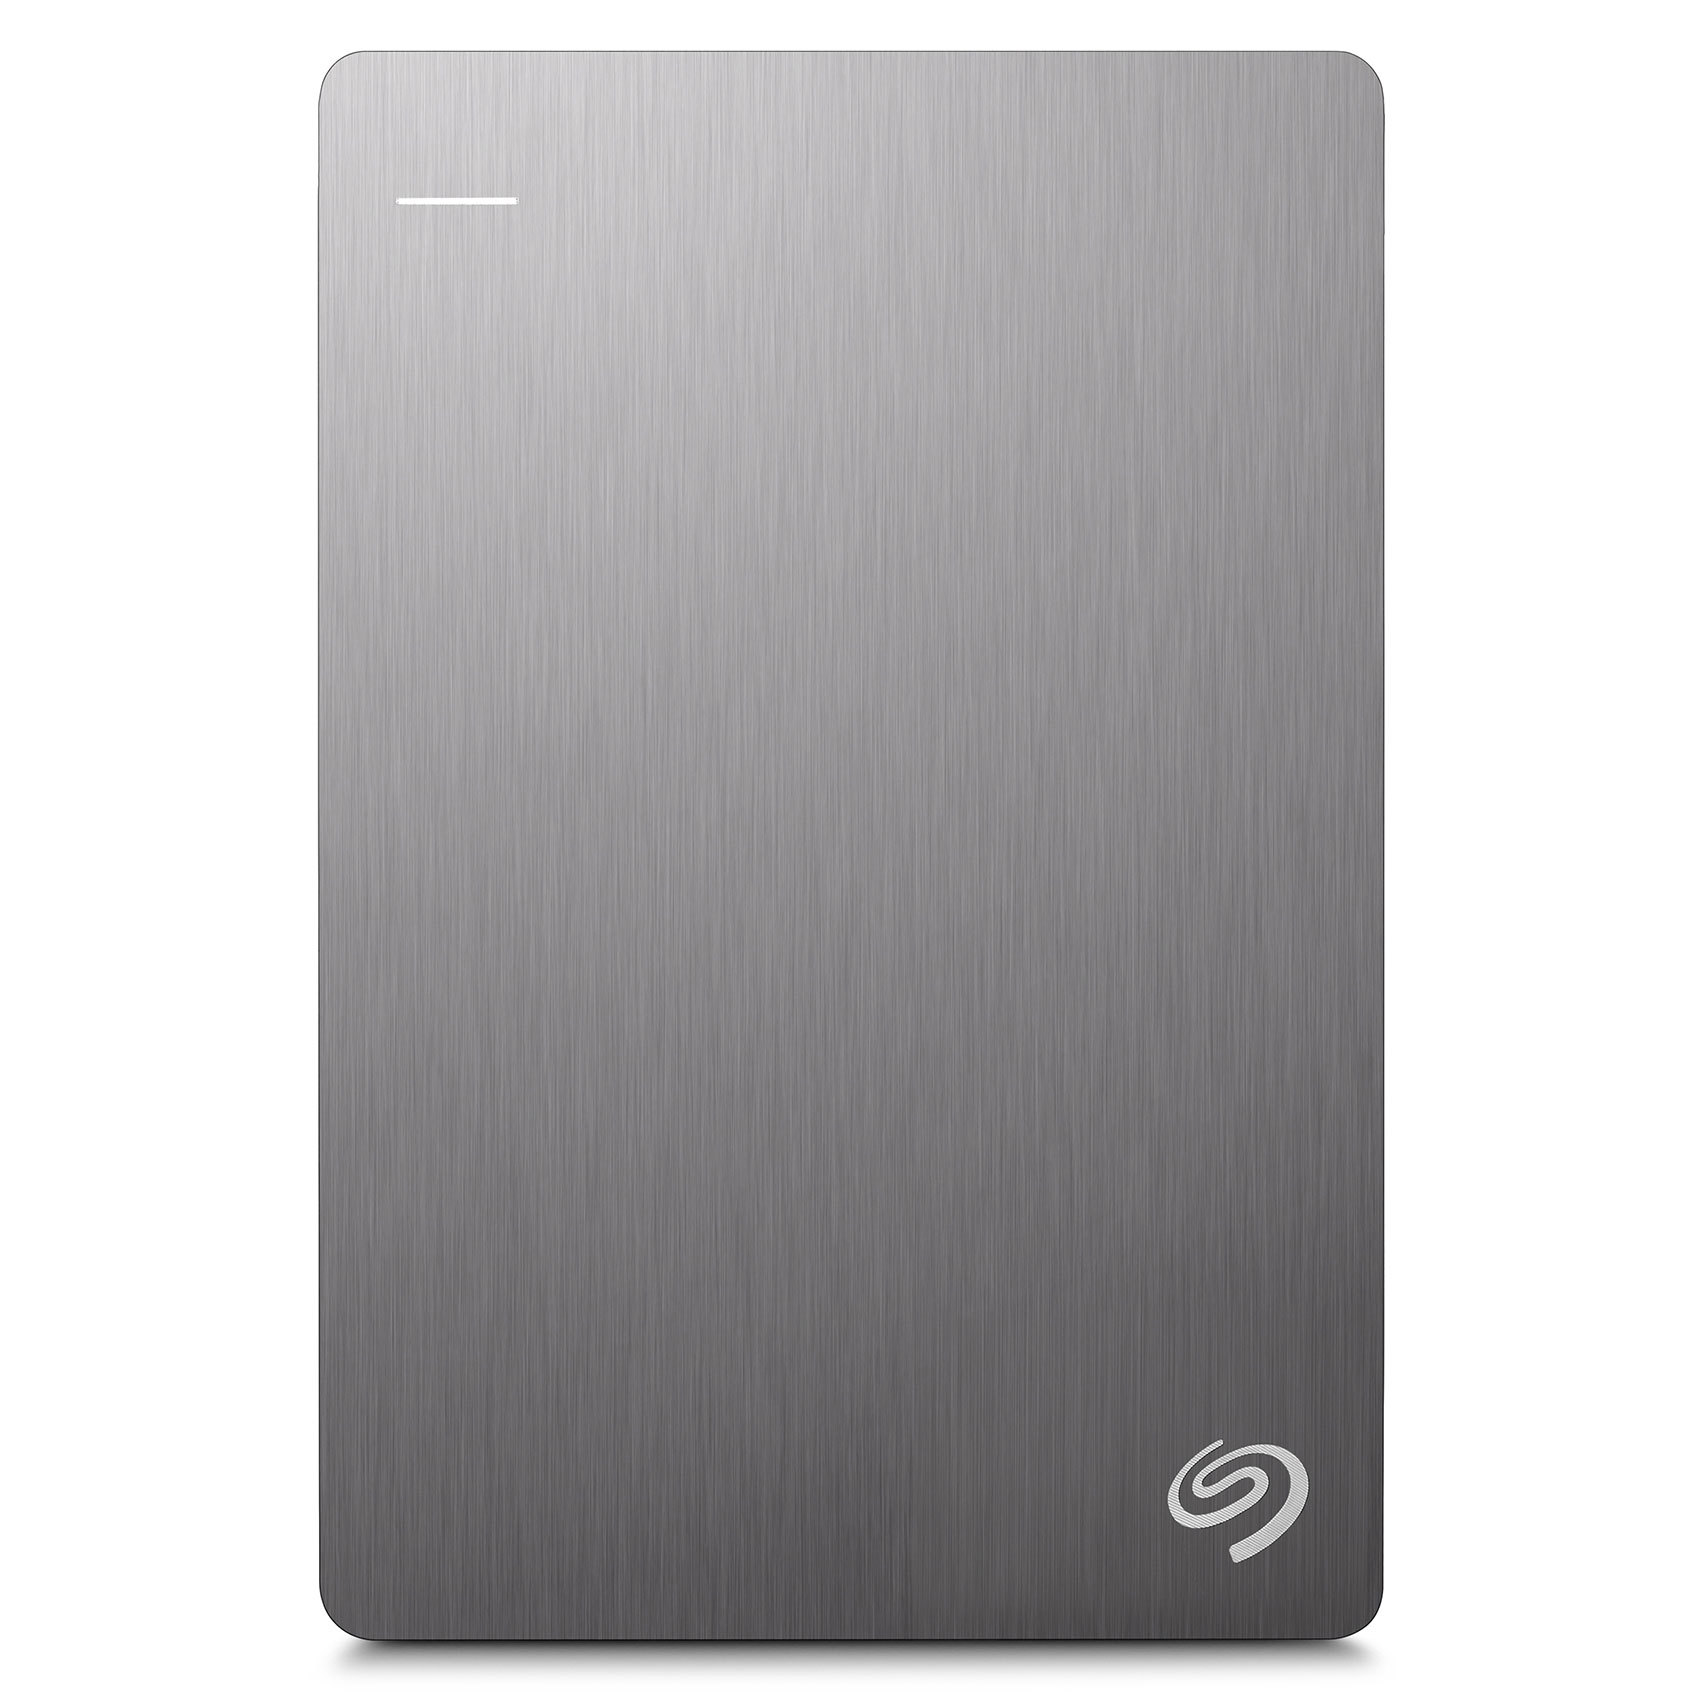 SEAGATE HDD 1TB BKUP+ PORT SLIM SL